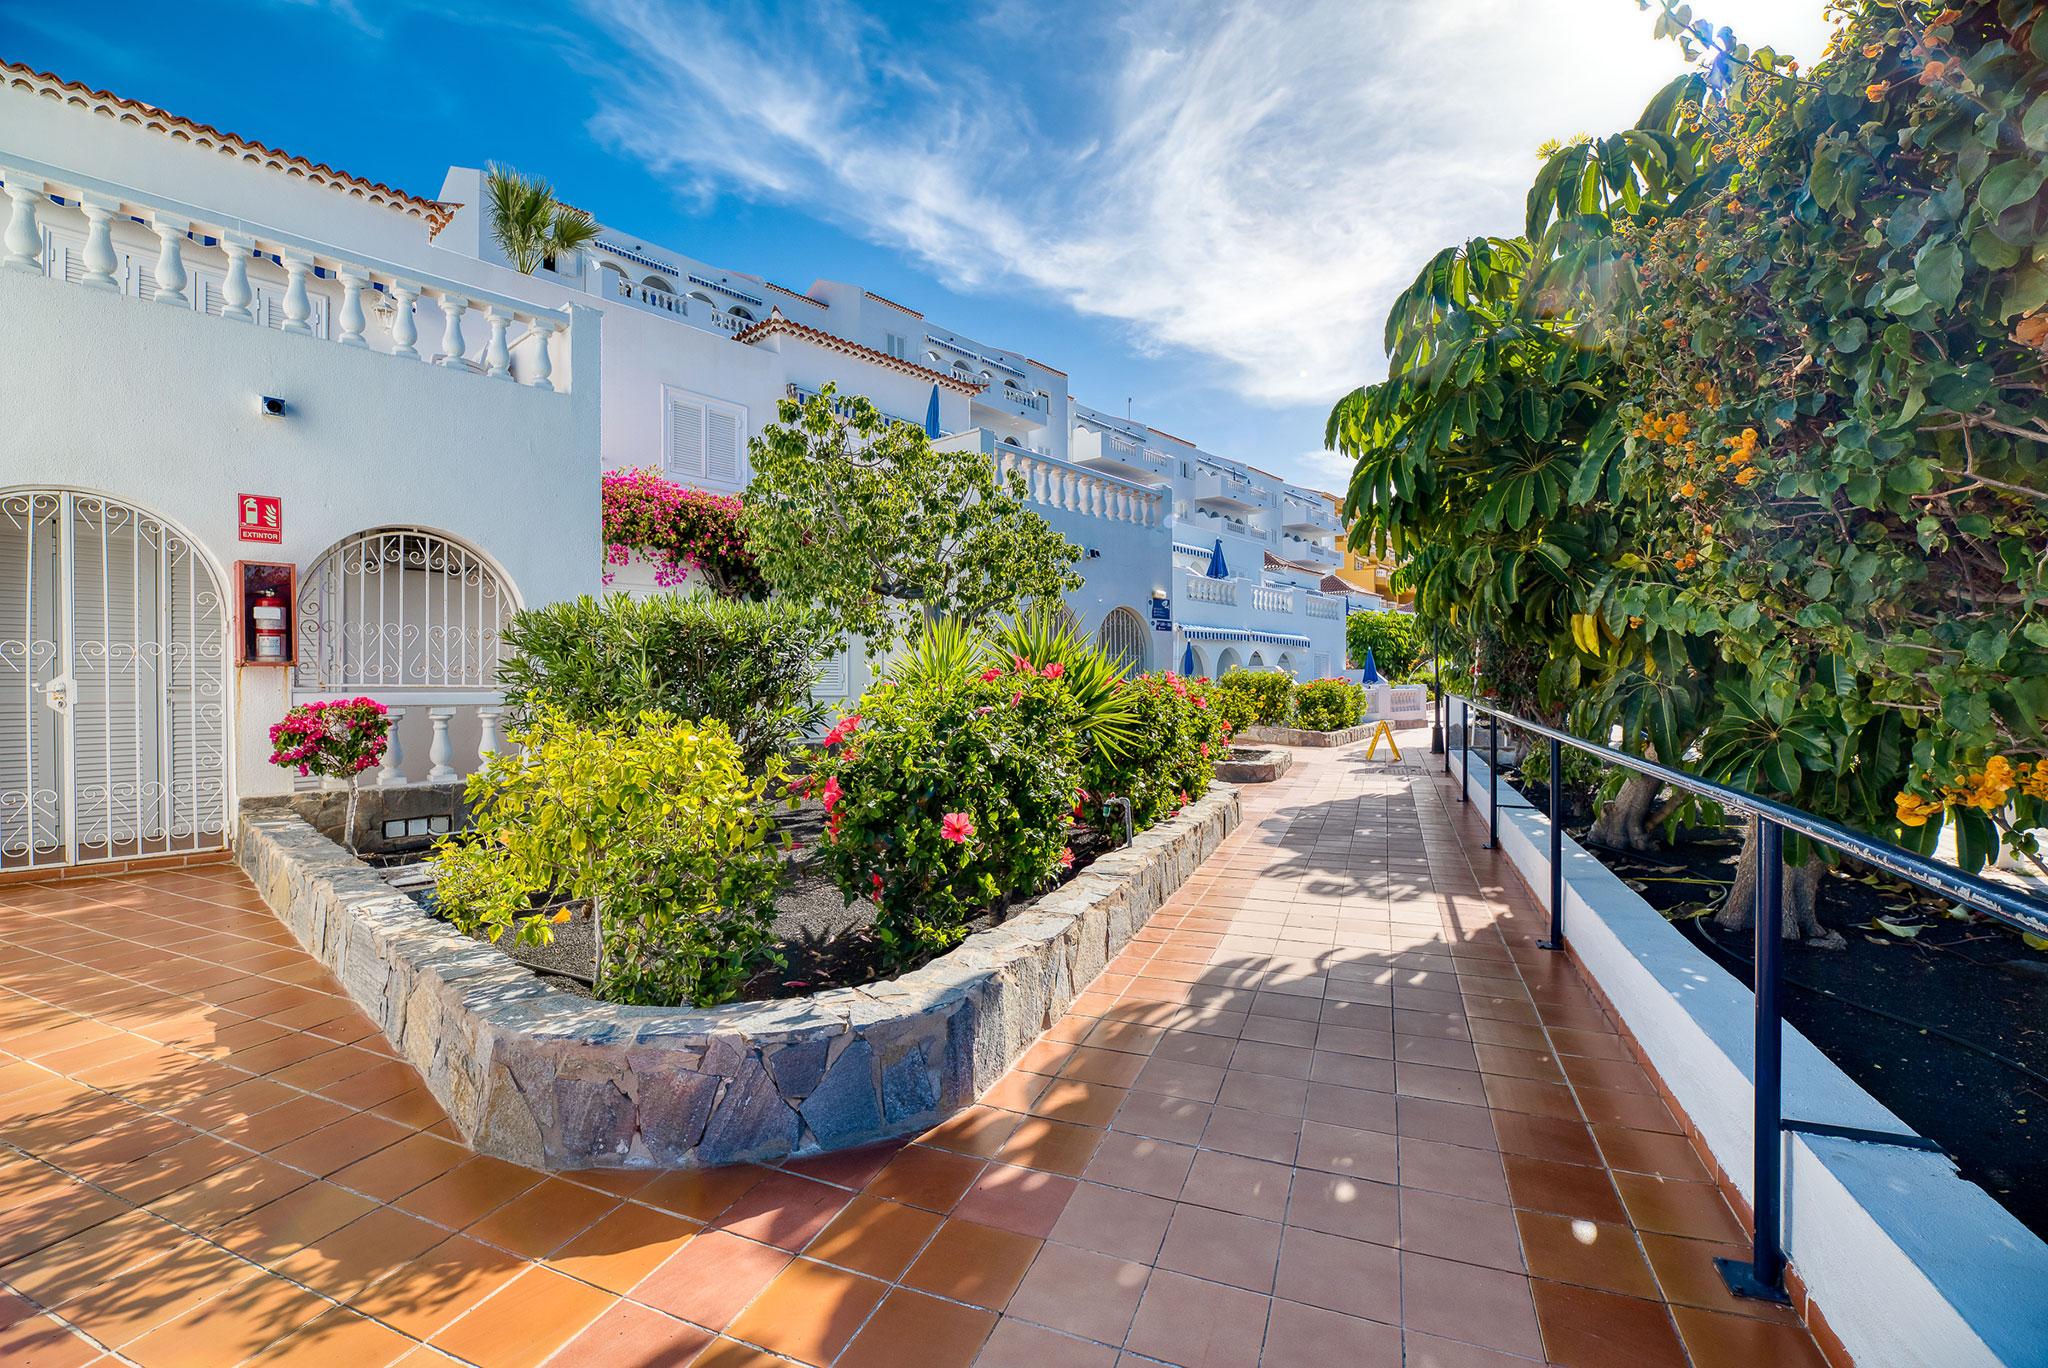 hotel-marques-garden (2)